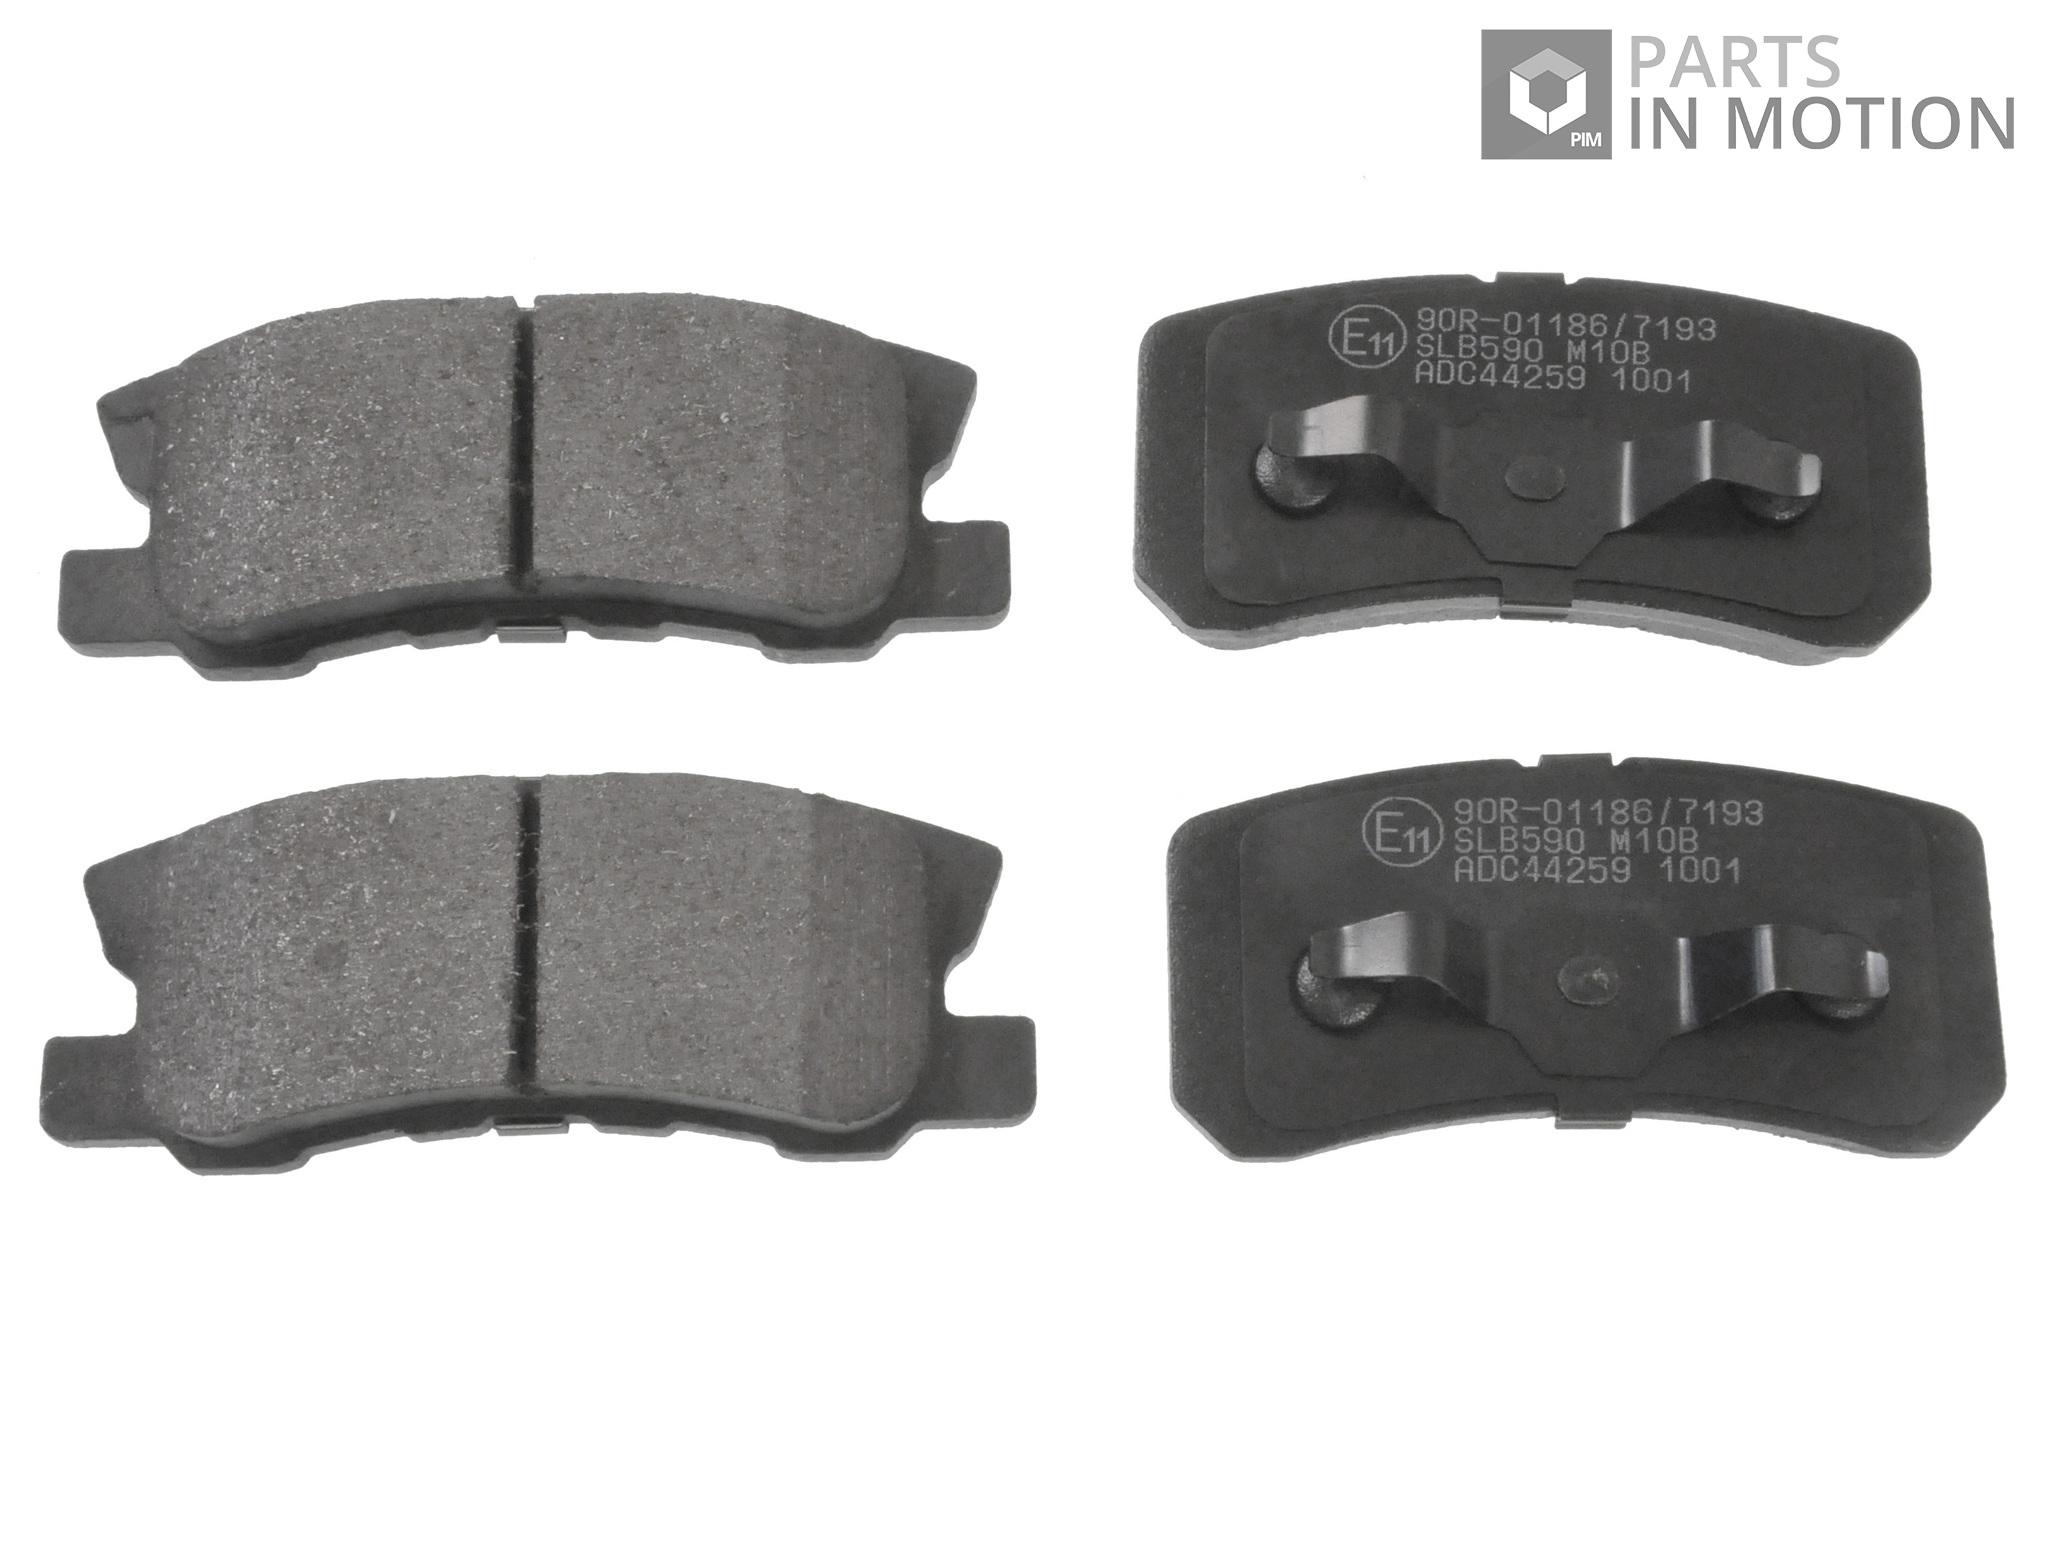 Citroen DS4 2.0 HDi 160 Genuine Braymann Front Brake Pads Set